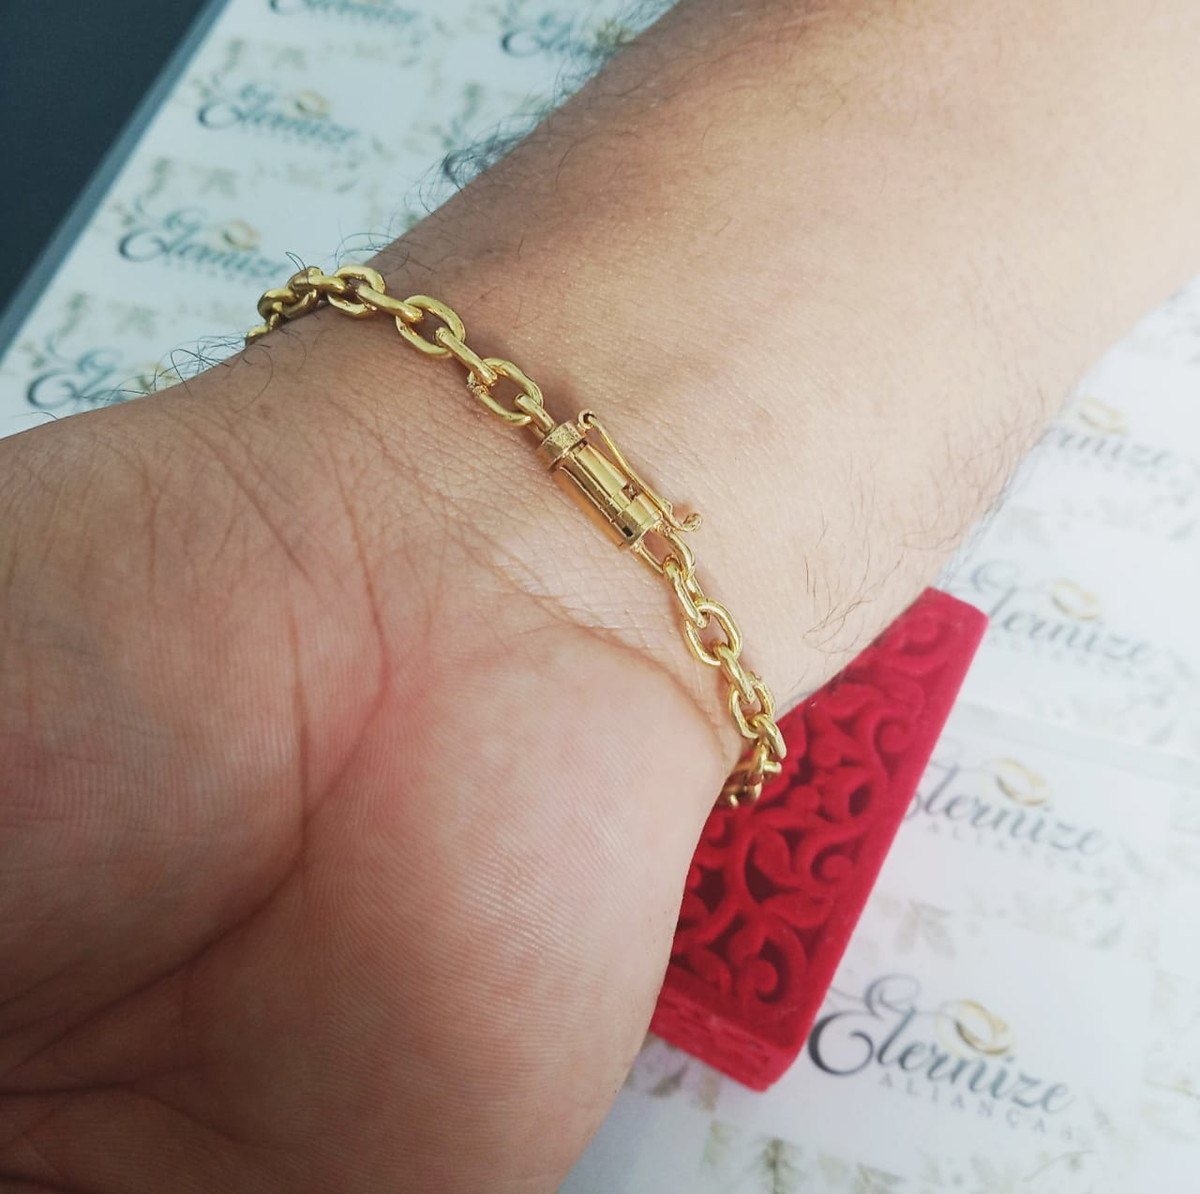 1ed99e74009 Pulseira cartier cadeado moeda antiga cor de ouro 5mm no Elo7 ...